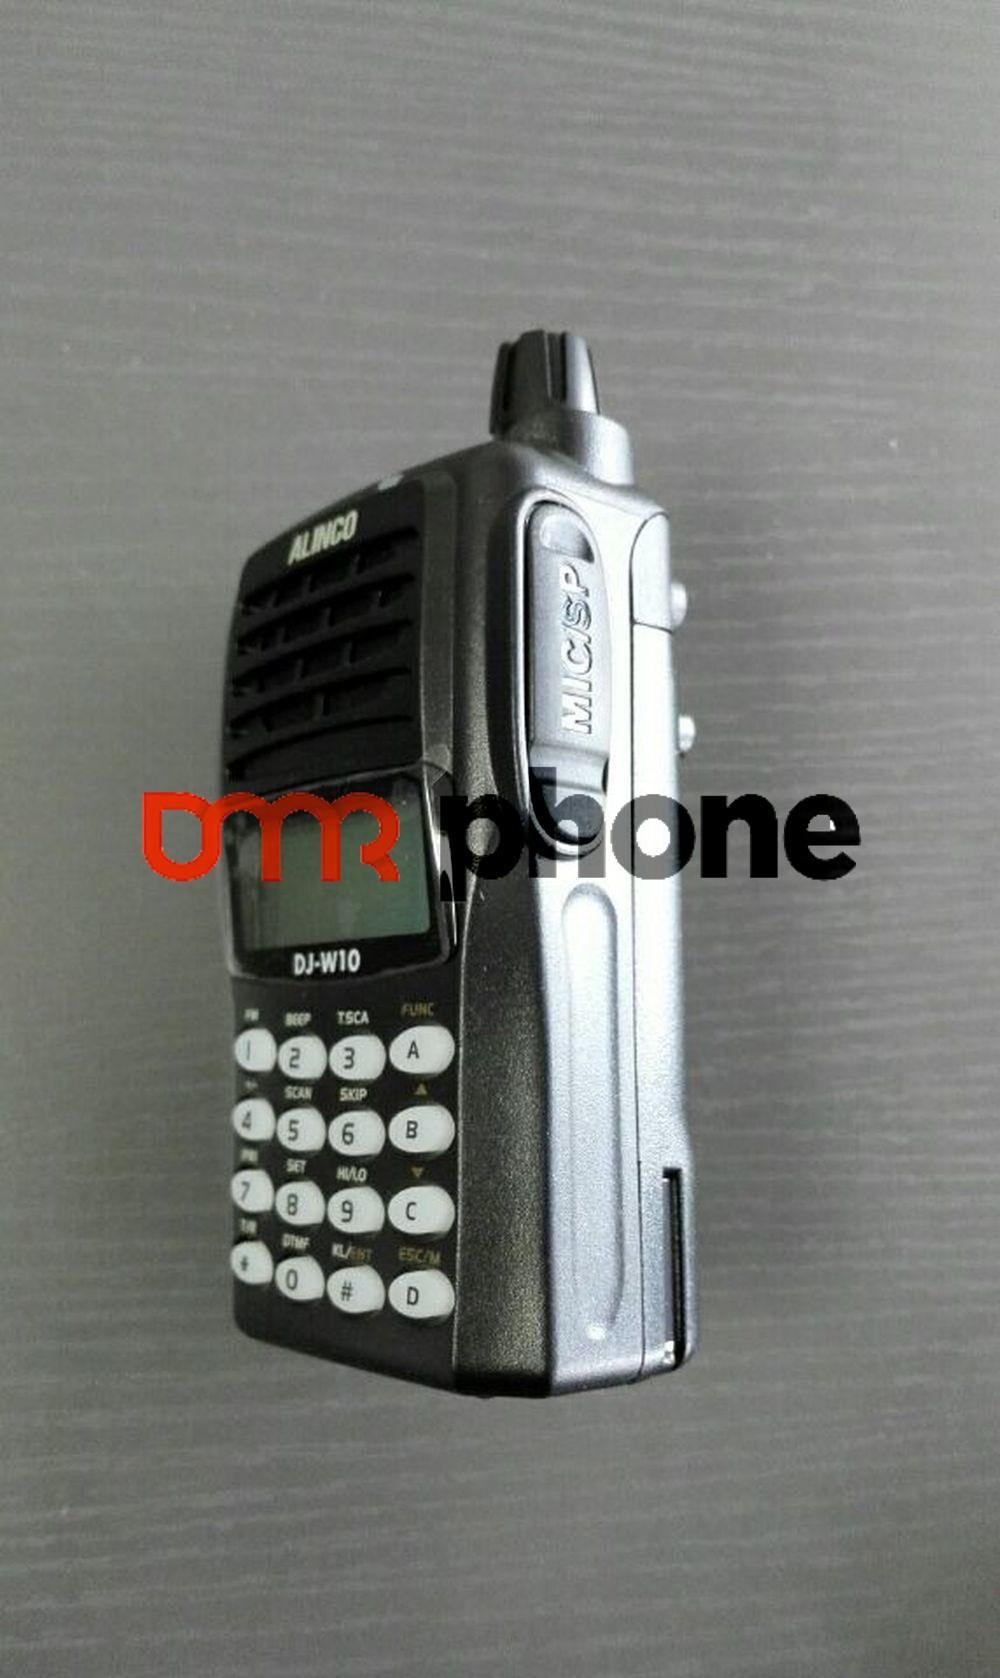 Alinco Dj W10 Ht Vhf Fm Transceiver Handheld Walkie Talkie